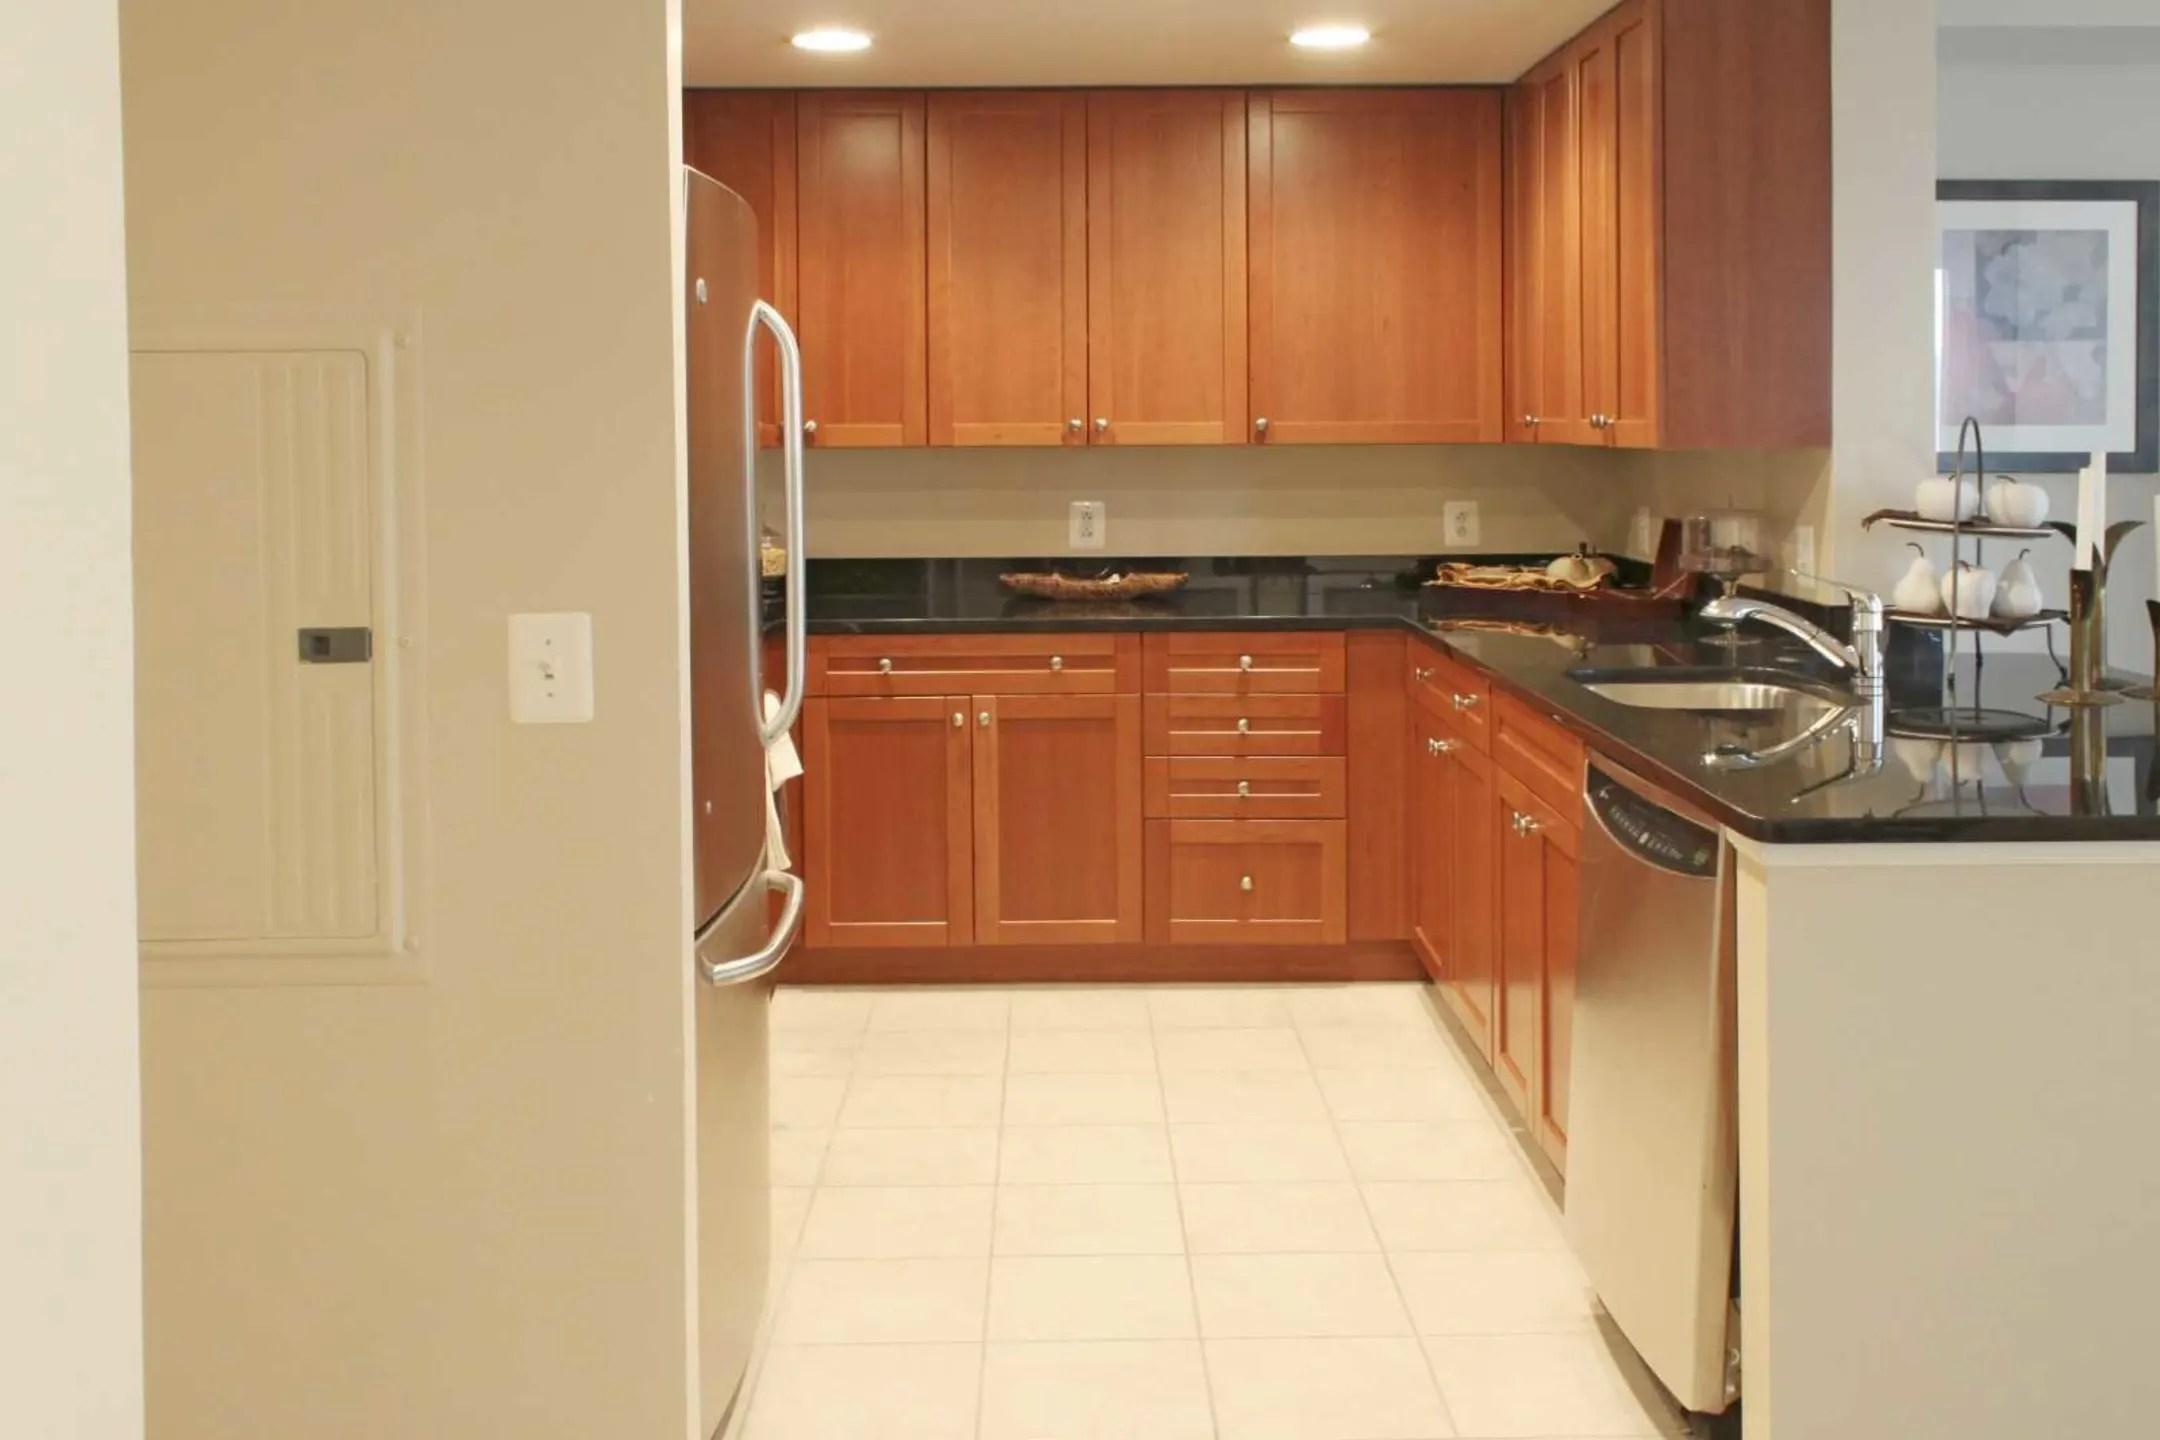 kitchen cabinets alexandria va sink drain installation carlyle place apartments - alexandria, 22314 ...